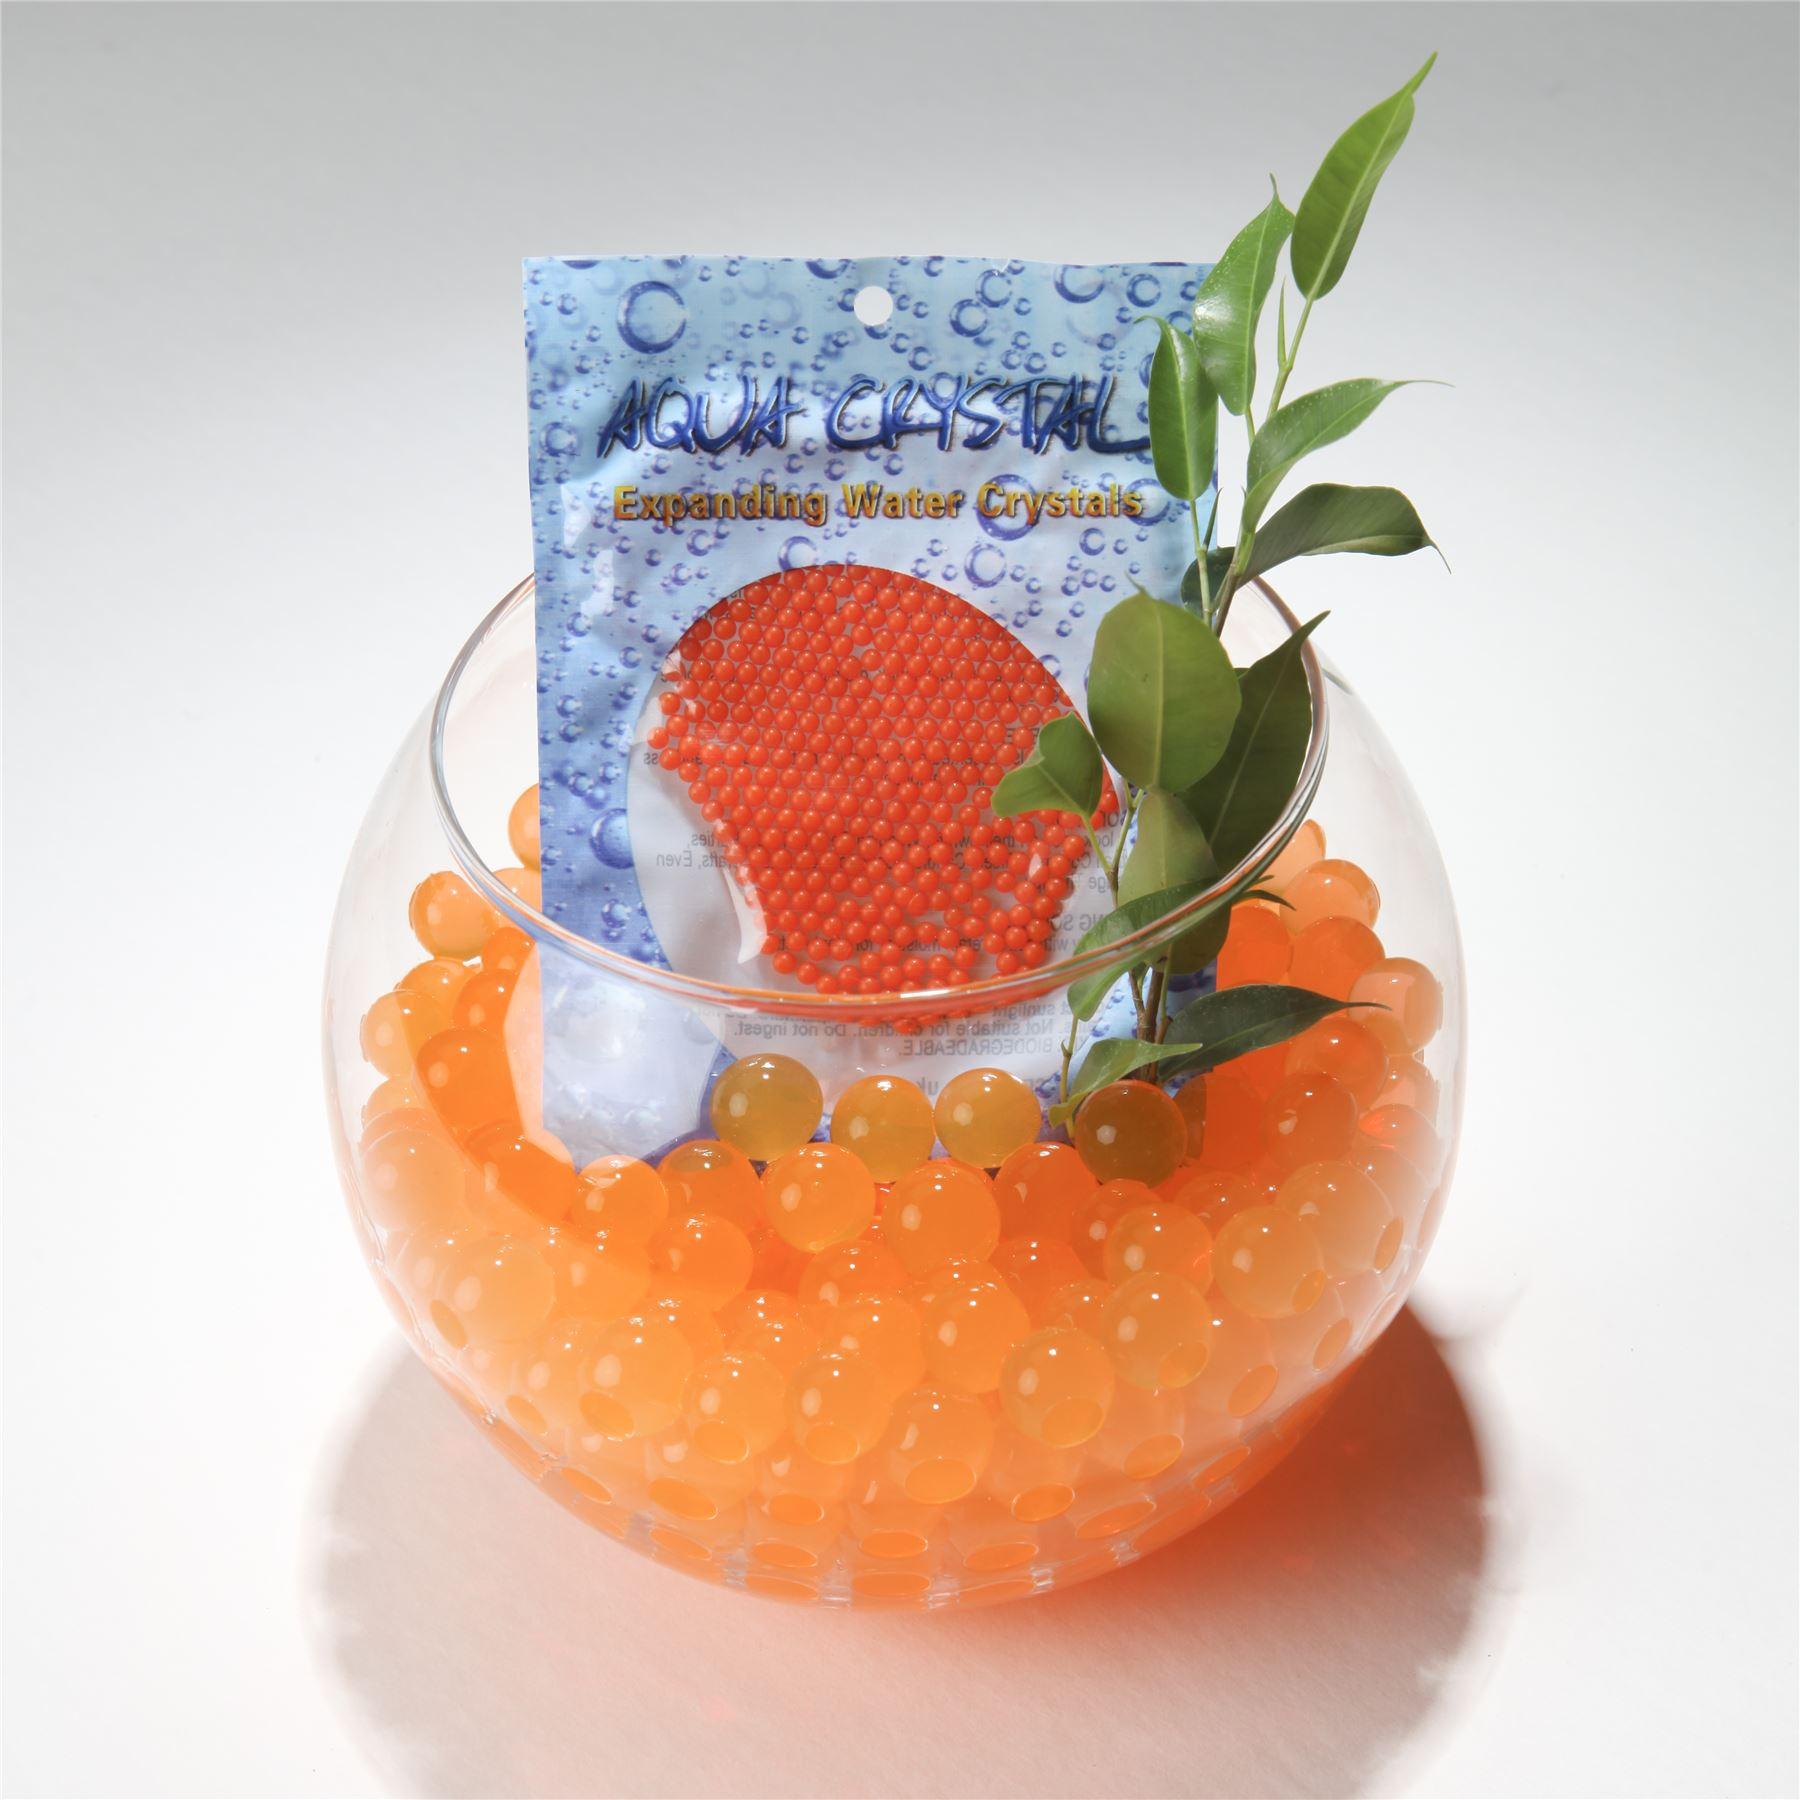 AQUA-CRYSTAL-Expanding-Water-Beads-Bio-Gel-Ball-Wedding-Centrepiece-Vase-Filler